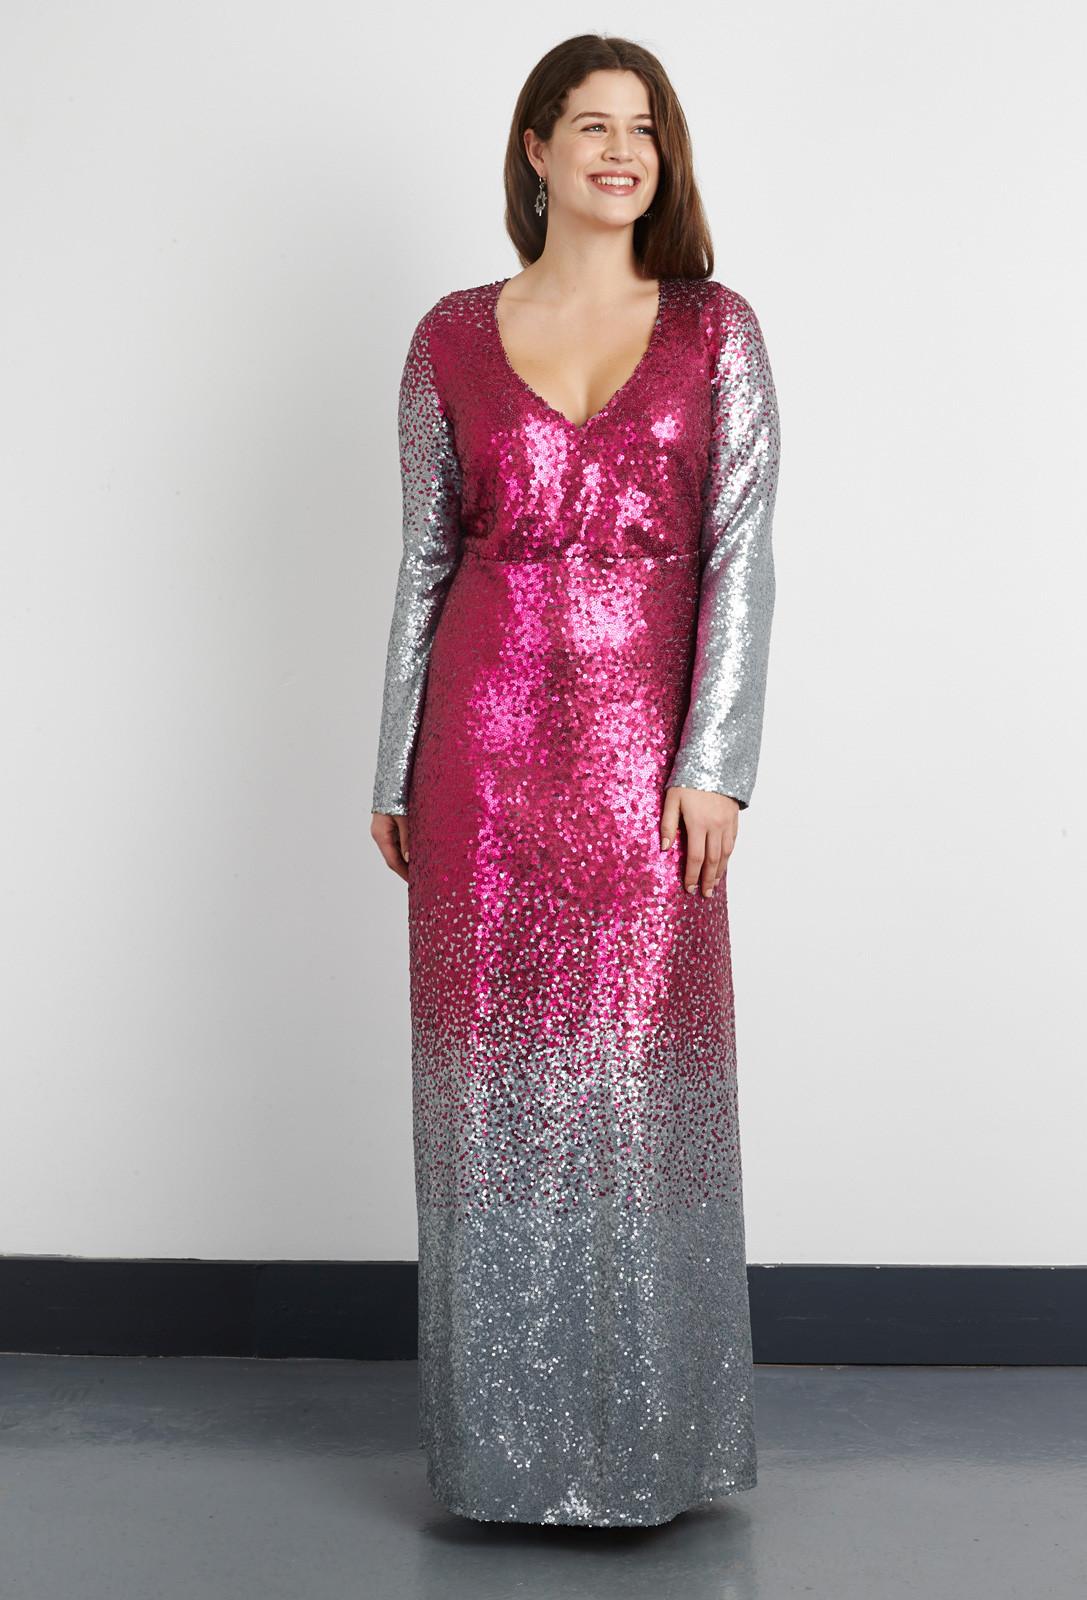 8bcd892382d Ombre Sequin Maxi Dress from Anna Scholz plus size dresses ...